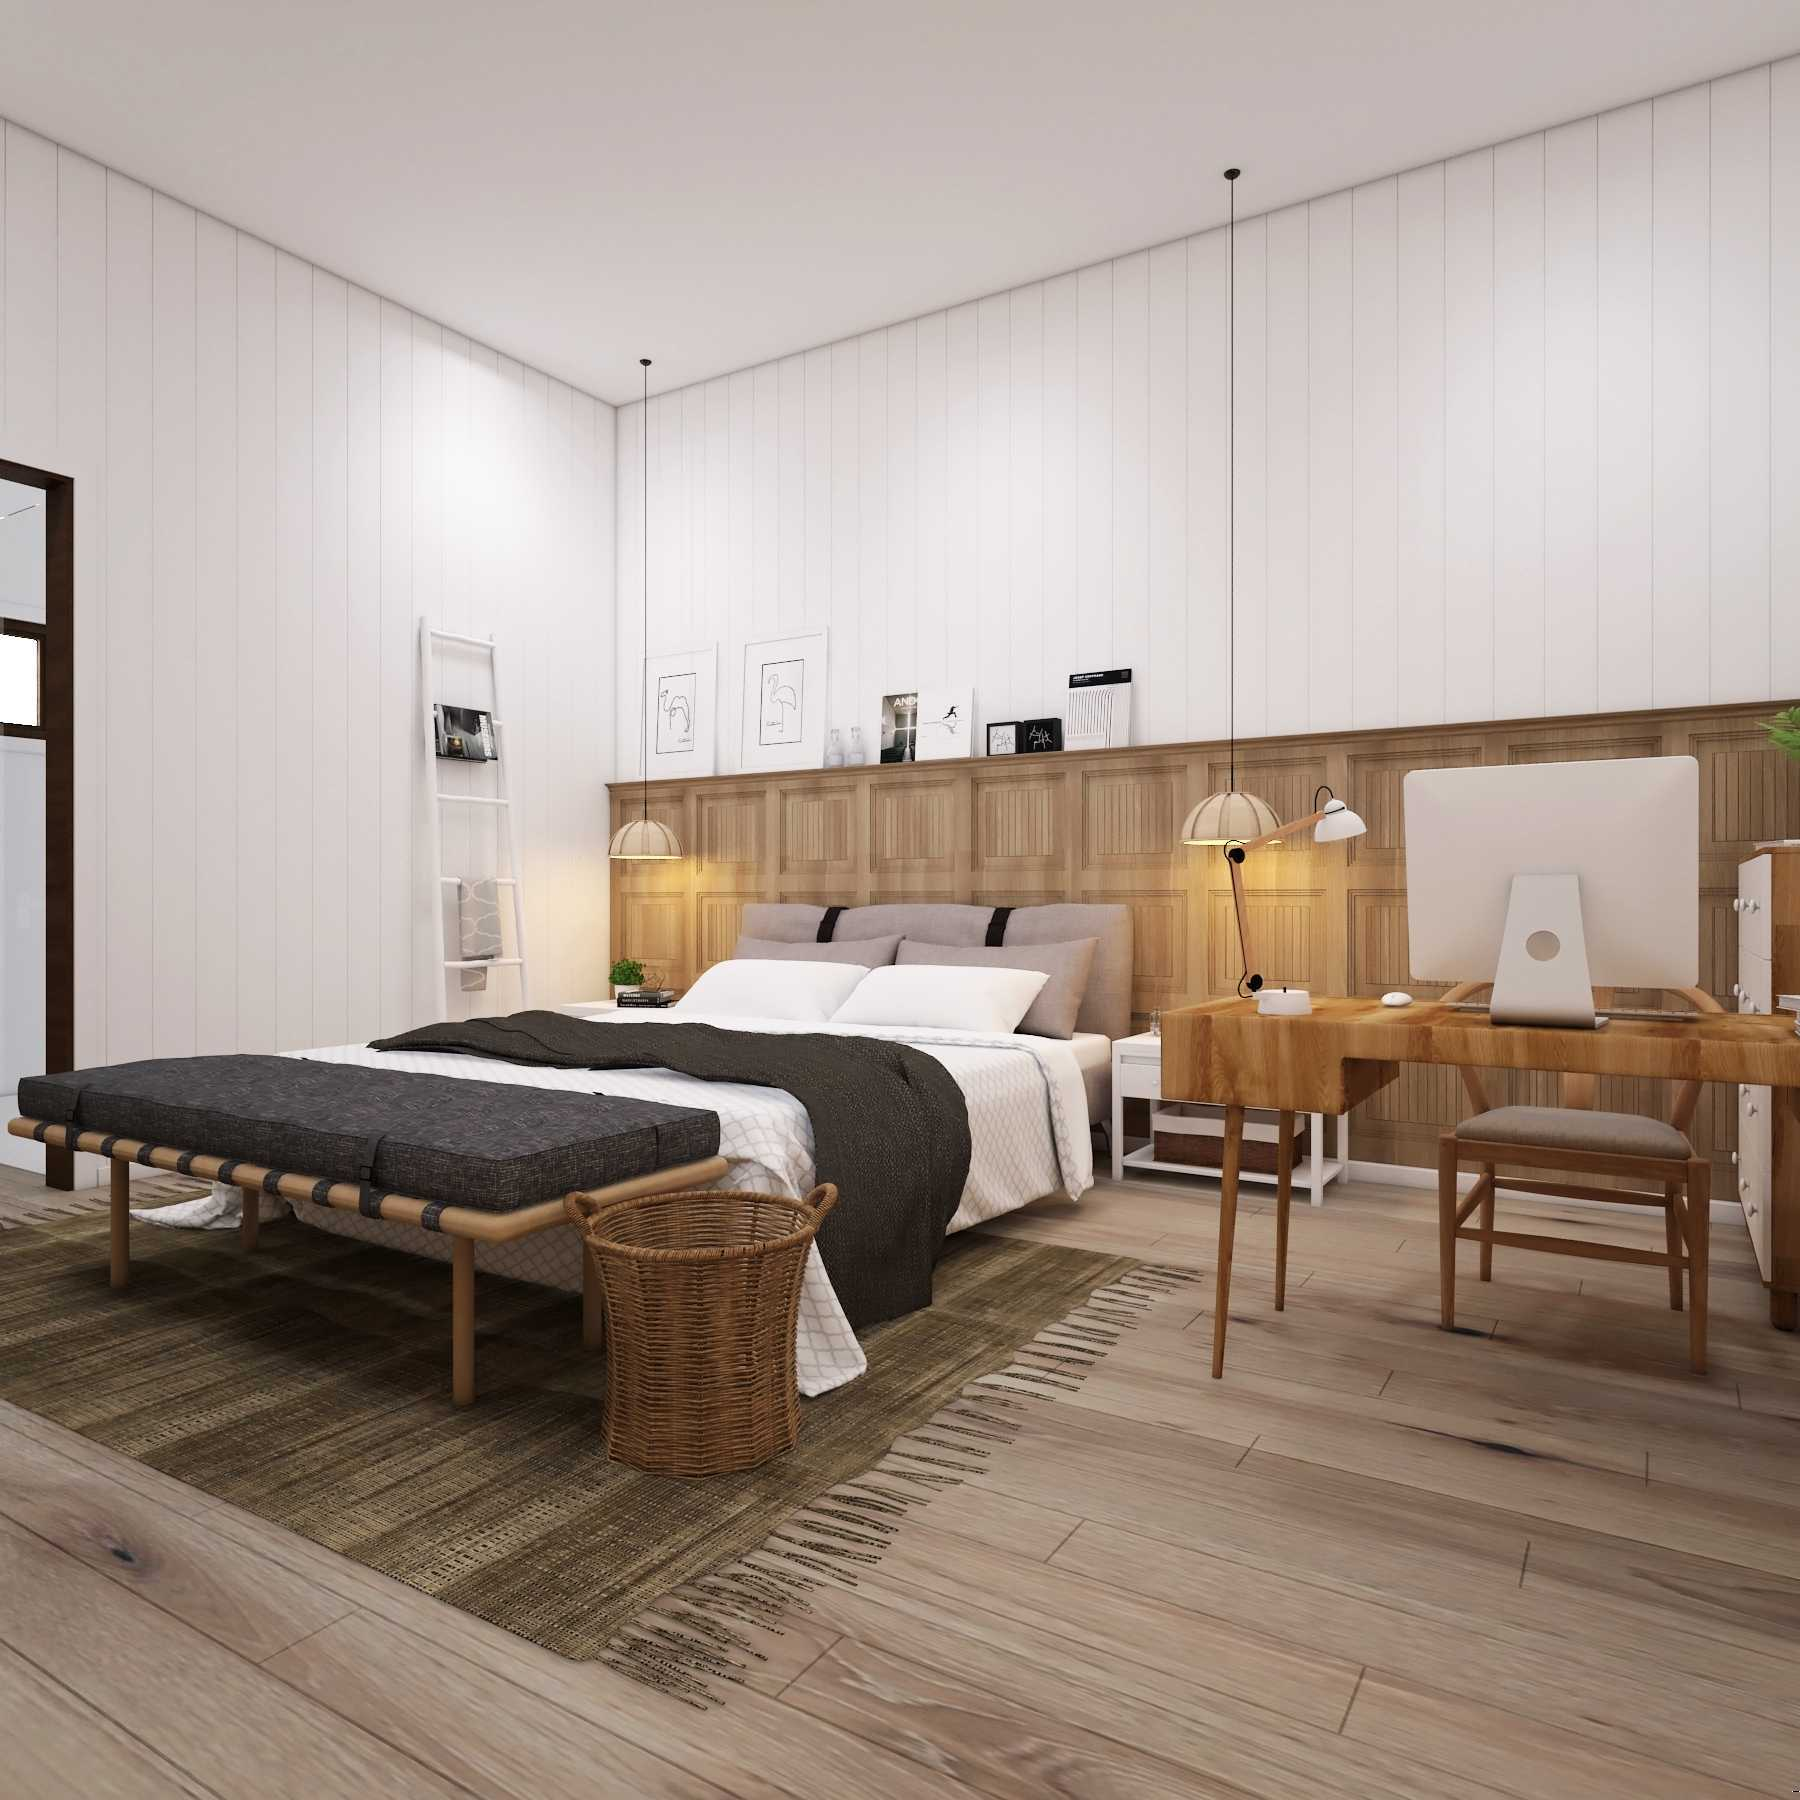 La.casa Scandinavian Medan, North Sumatera, Indonesia Medan, North Sumatera, Indonesia Bedroom Skandinavia  15453